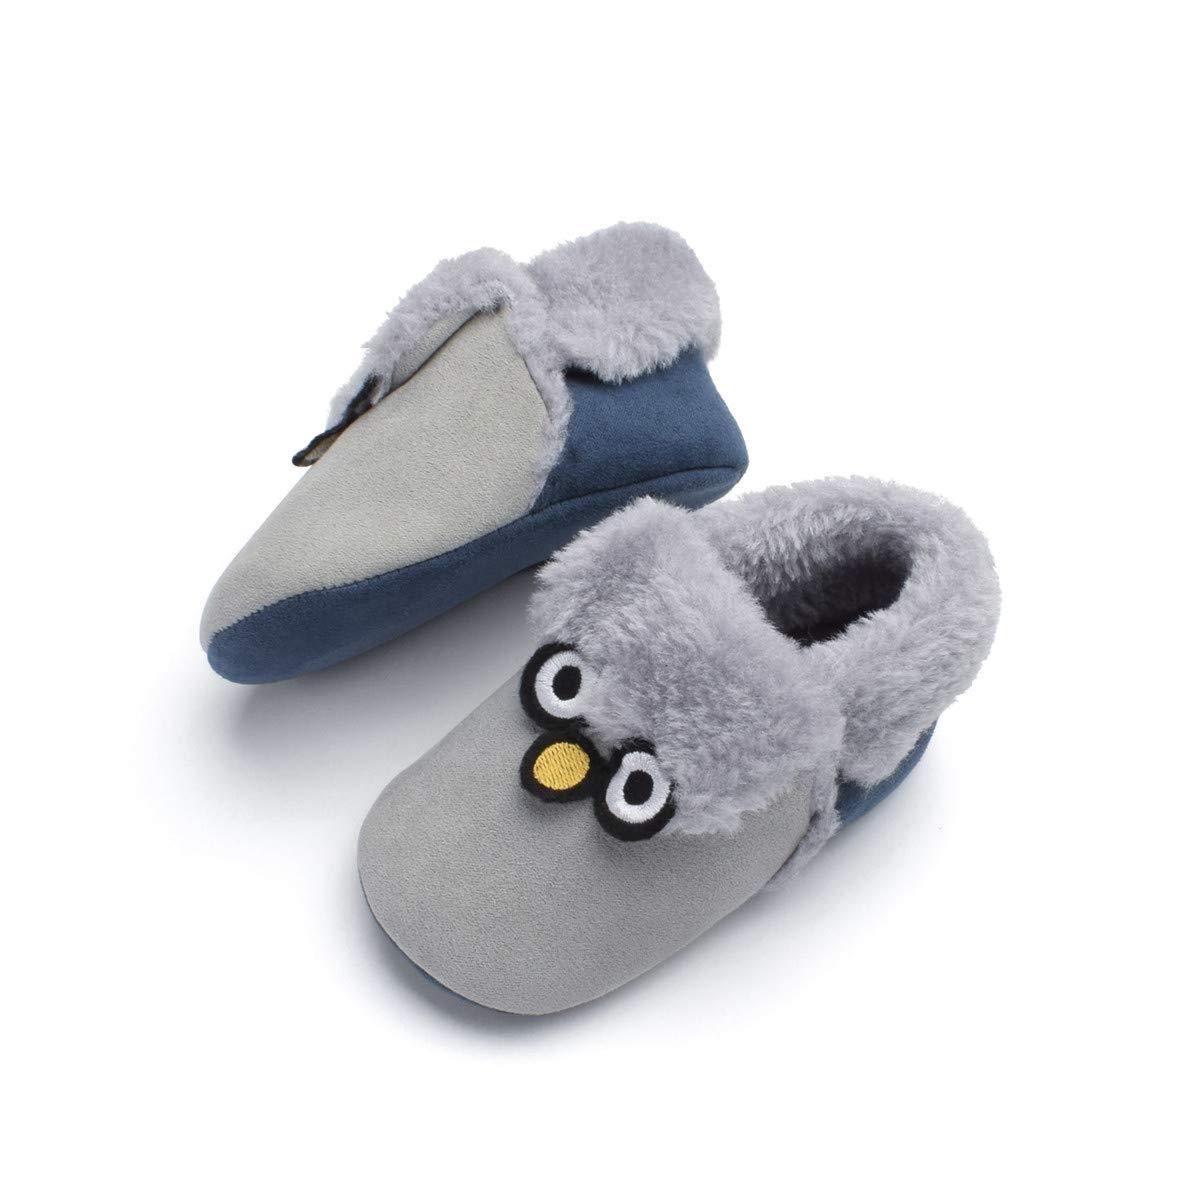 wwffoo Cute Baby Girls Newborn Infant Cartoon Anti-Slip Home Shoes Sneaker 0-15 Months